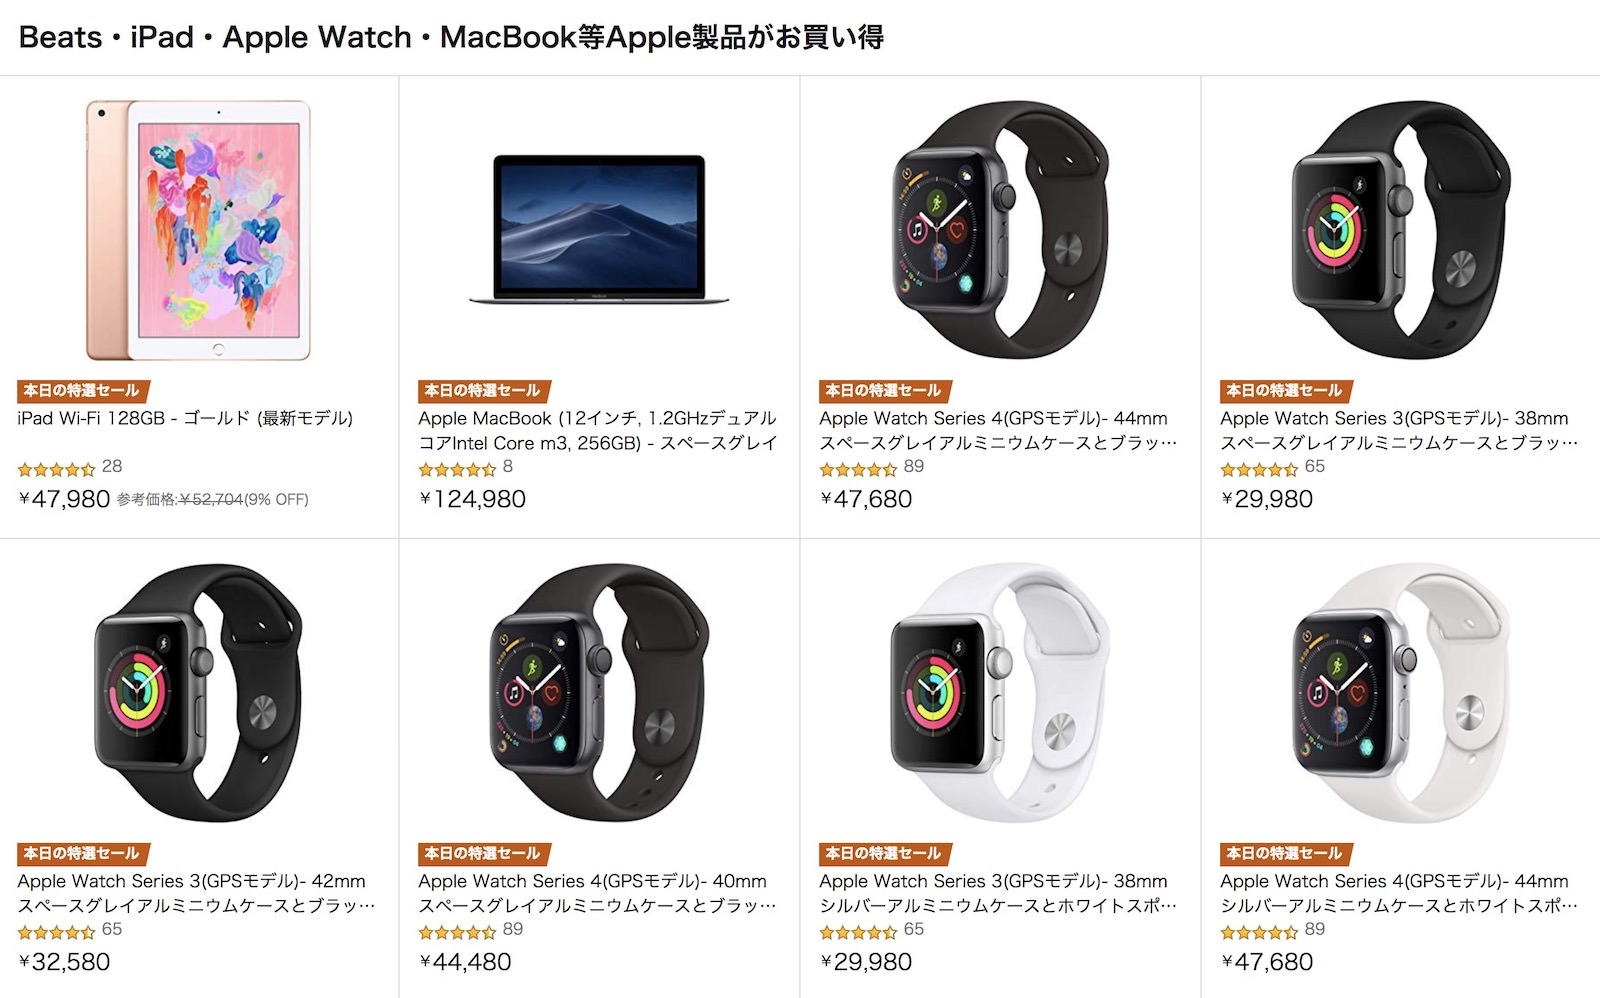 Beats iPad Applewatch MacBook TimeSale